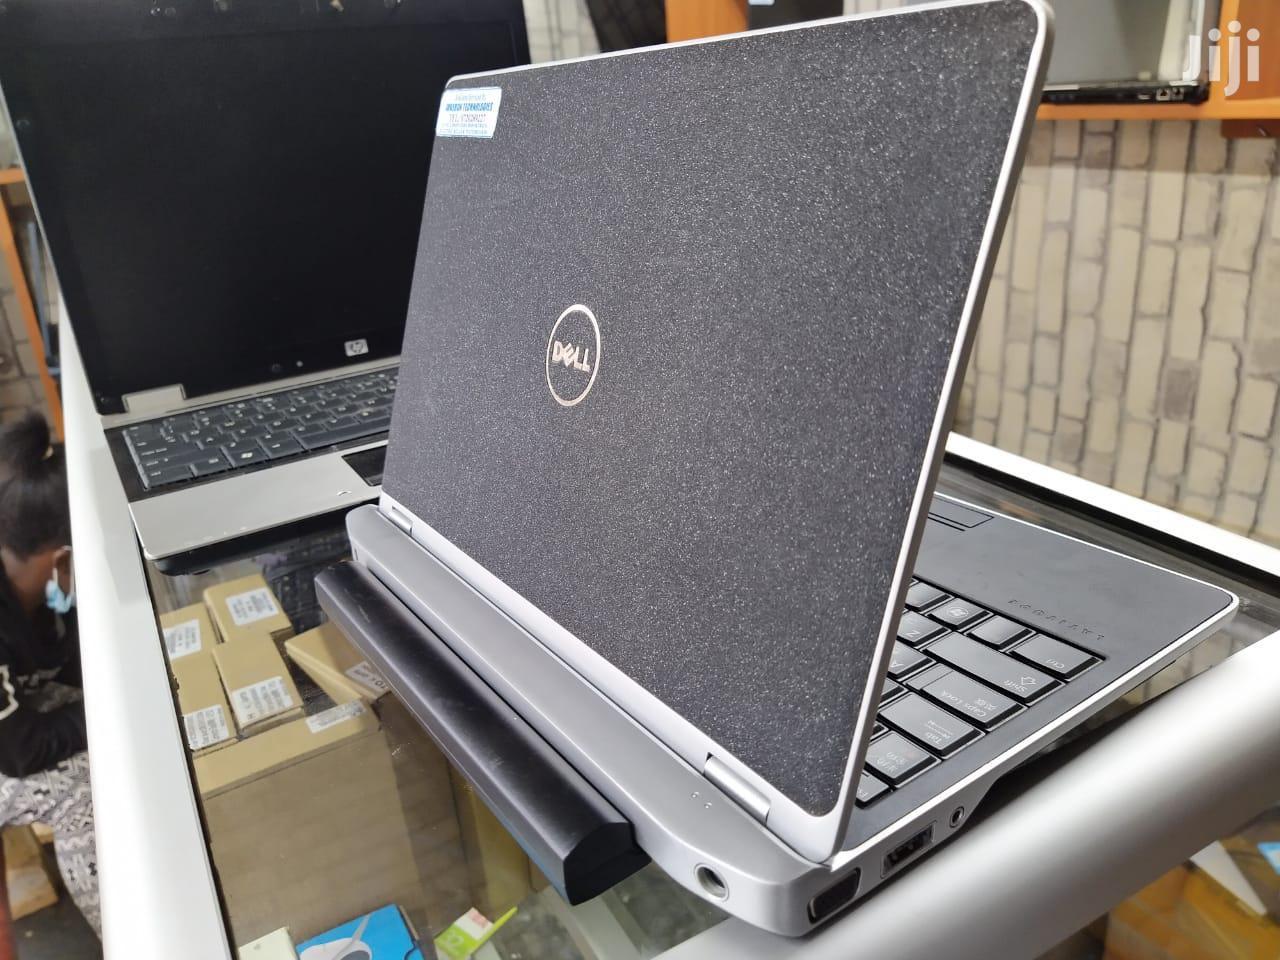 Laptop Dell Latitude E6220 4GB Intel Core i5 HDD 320GB   Laptops & Computers for sale in Kisii CBD, Kisii, Kenya